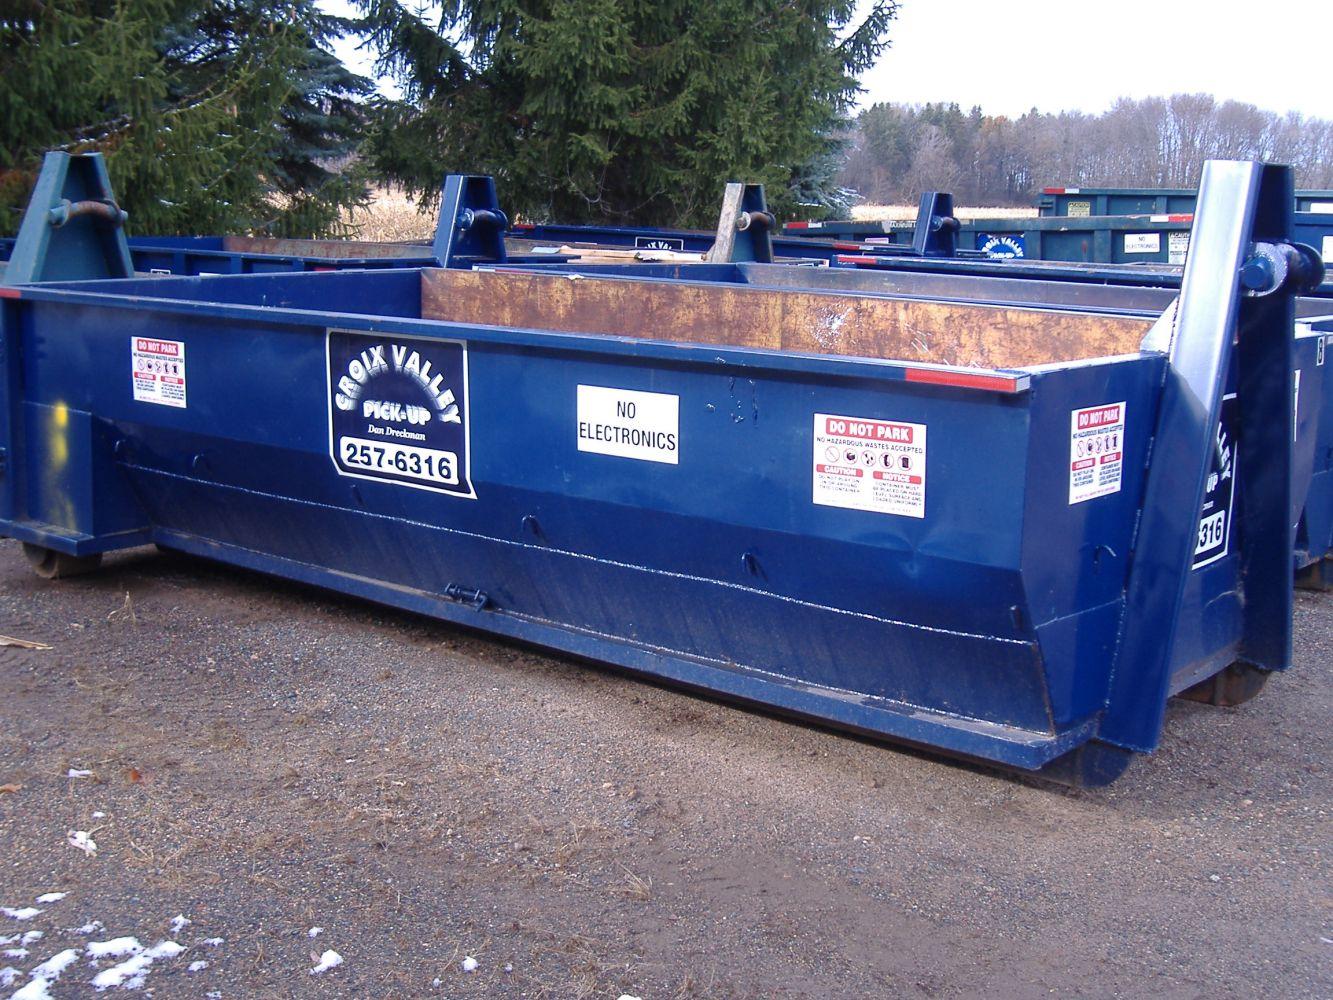 Dumpster Rentals Chisago City Mn Croix Valley Pick Up